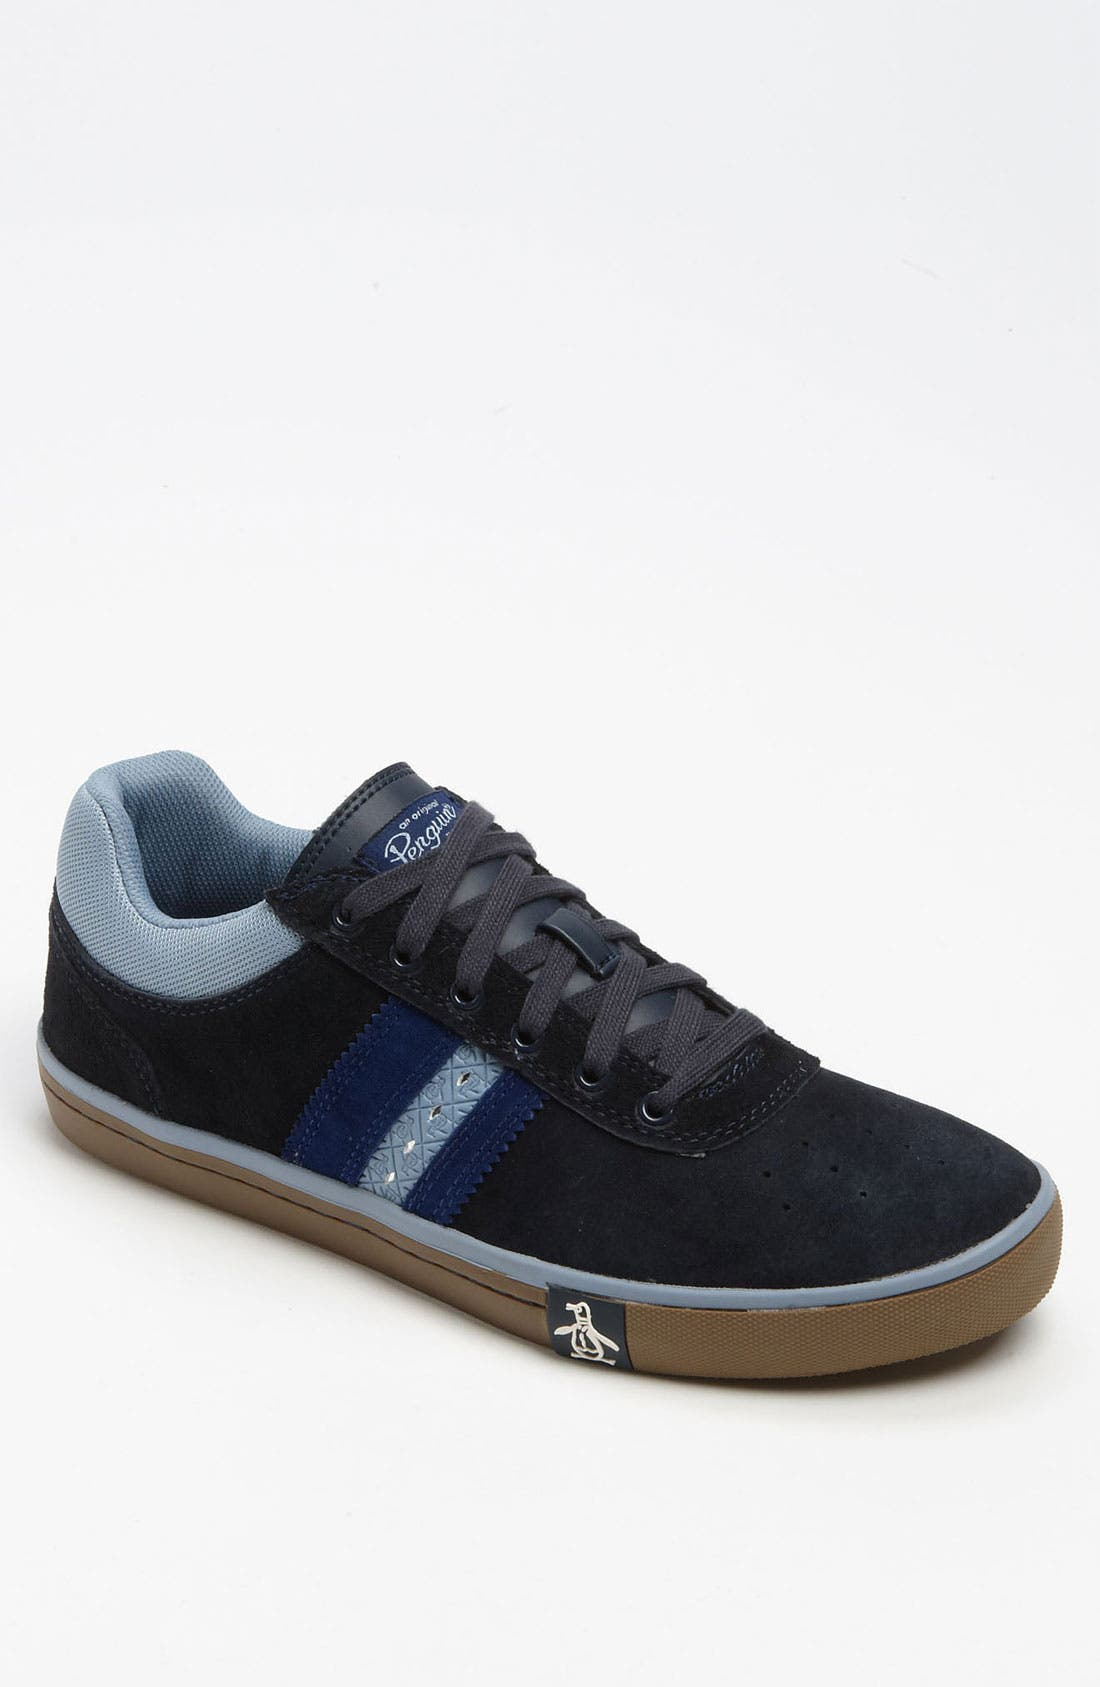 Main Image - Original Penguin 'Melt' Sneaker